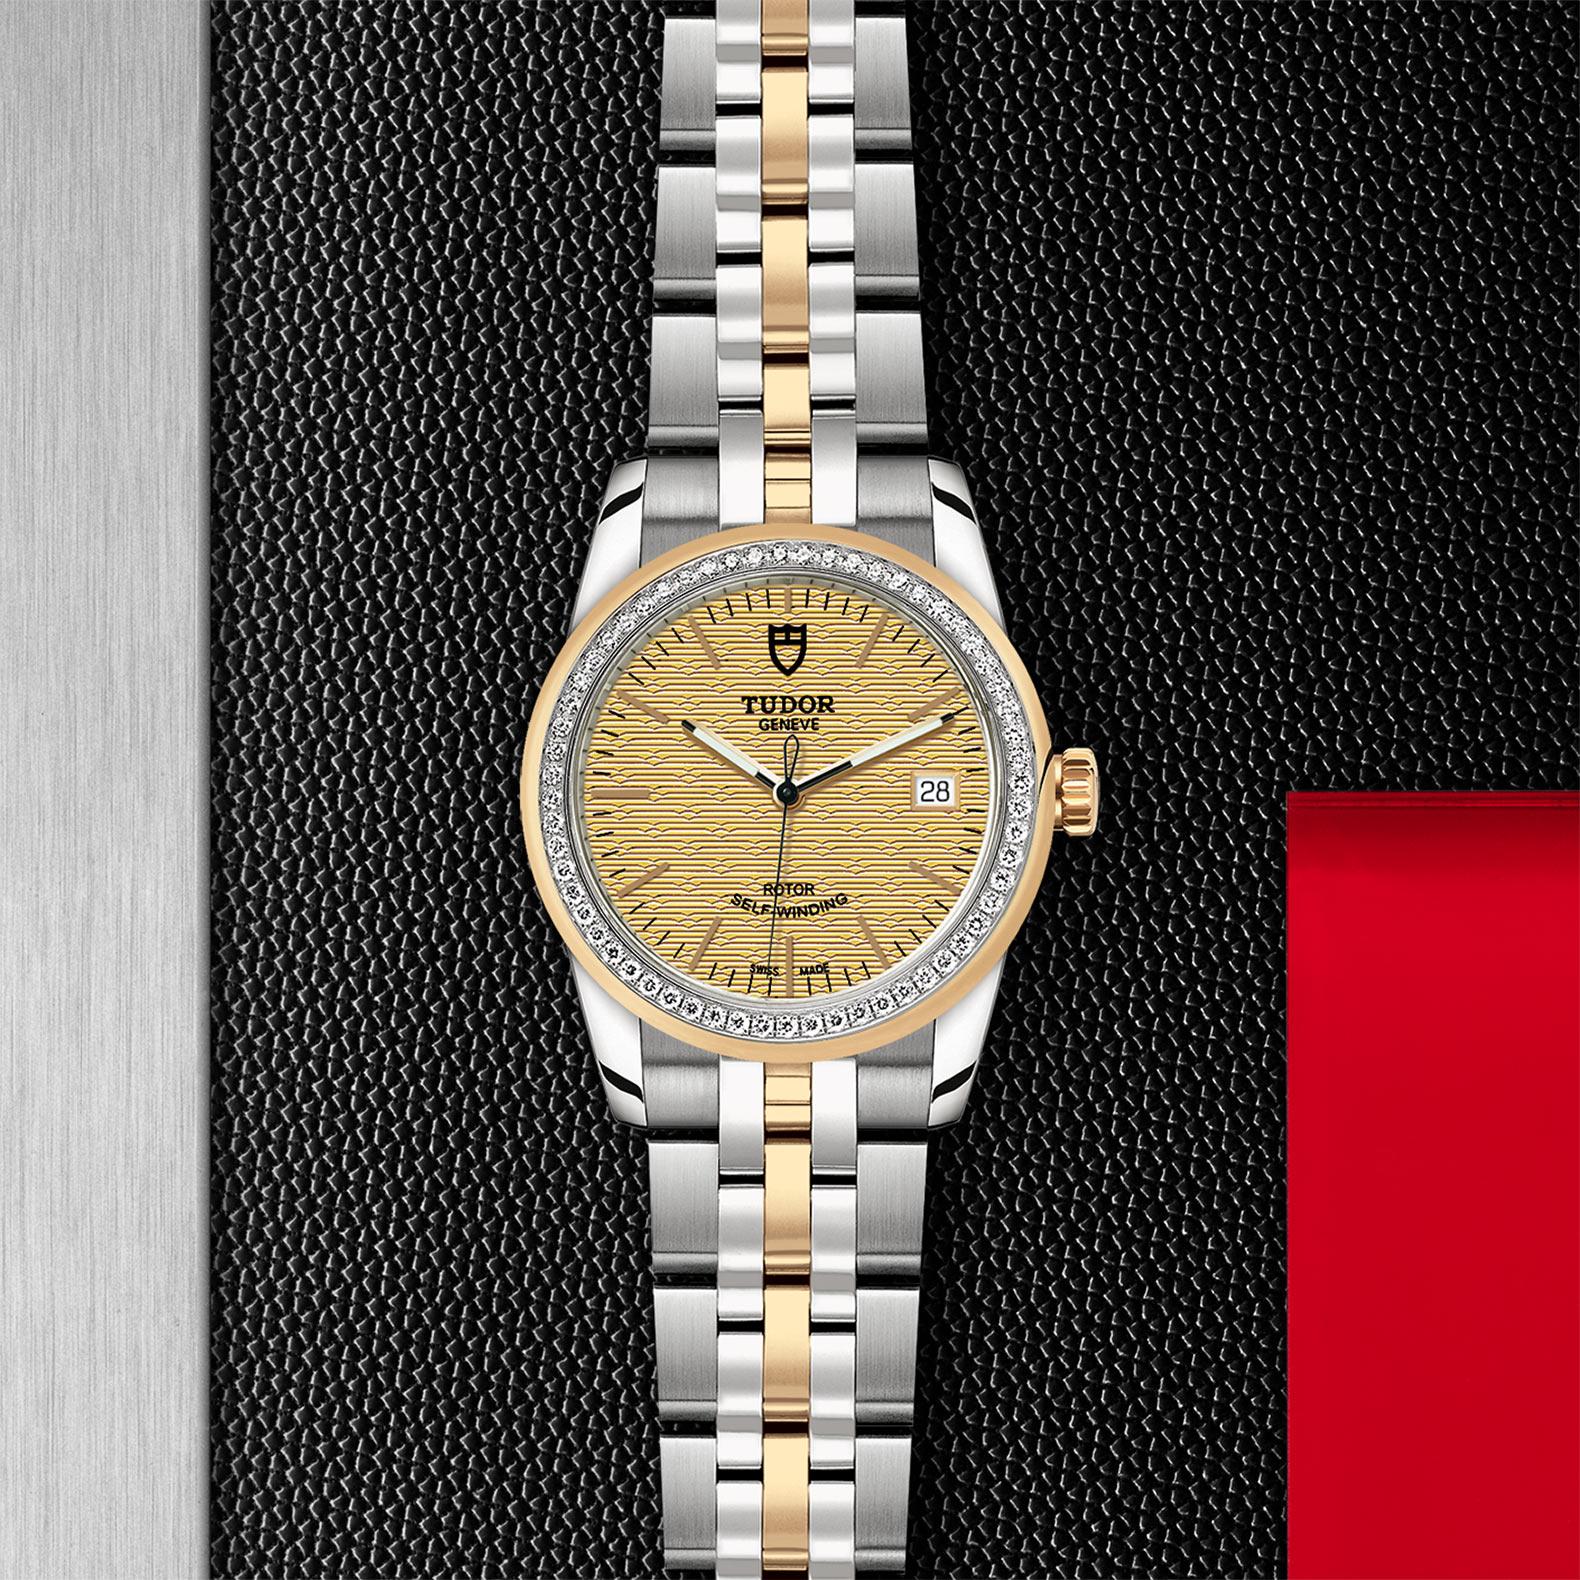 TUDOR Glamour Date - M55023-0027